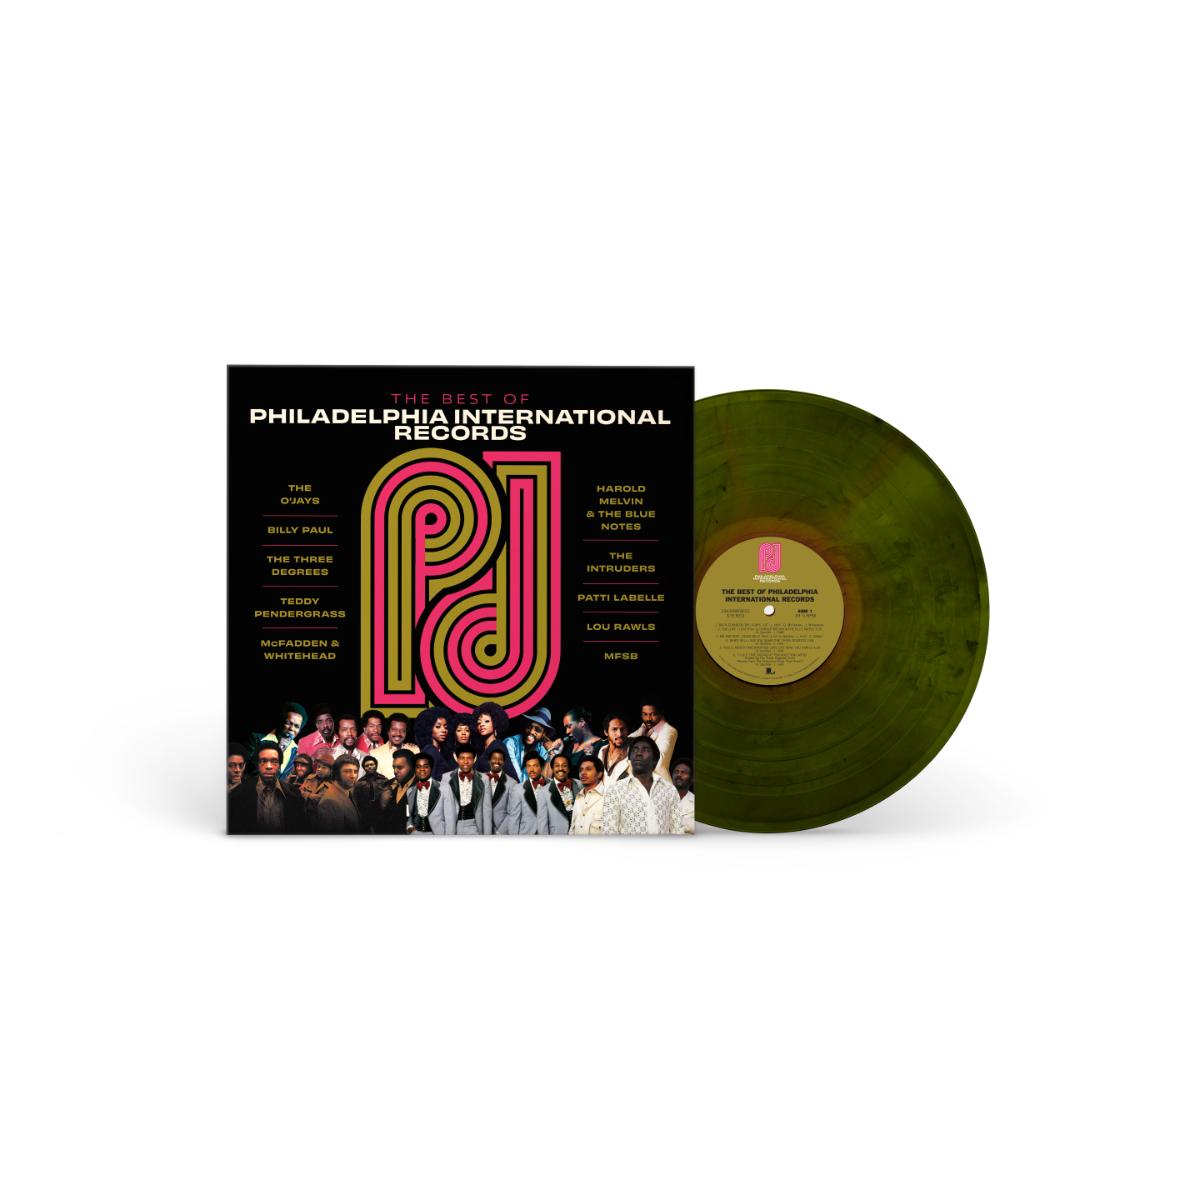 The Best Of Philadelphia International Records Green Swirl Vinyl (Spotify Exclusive)